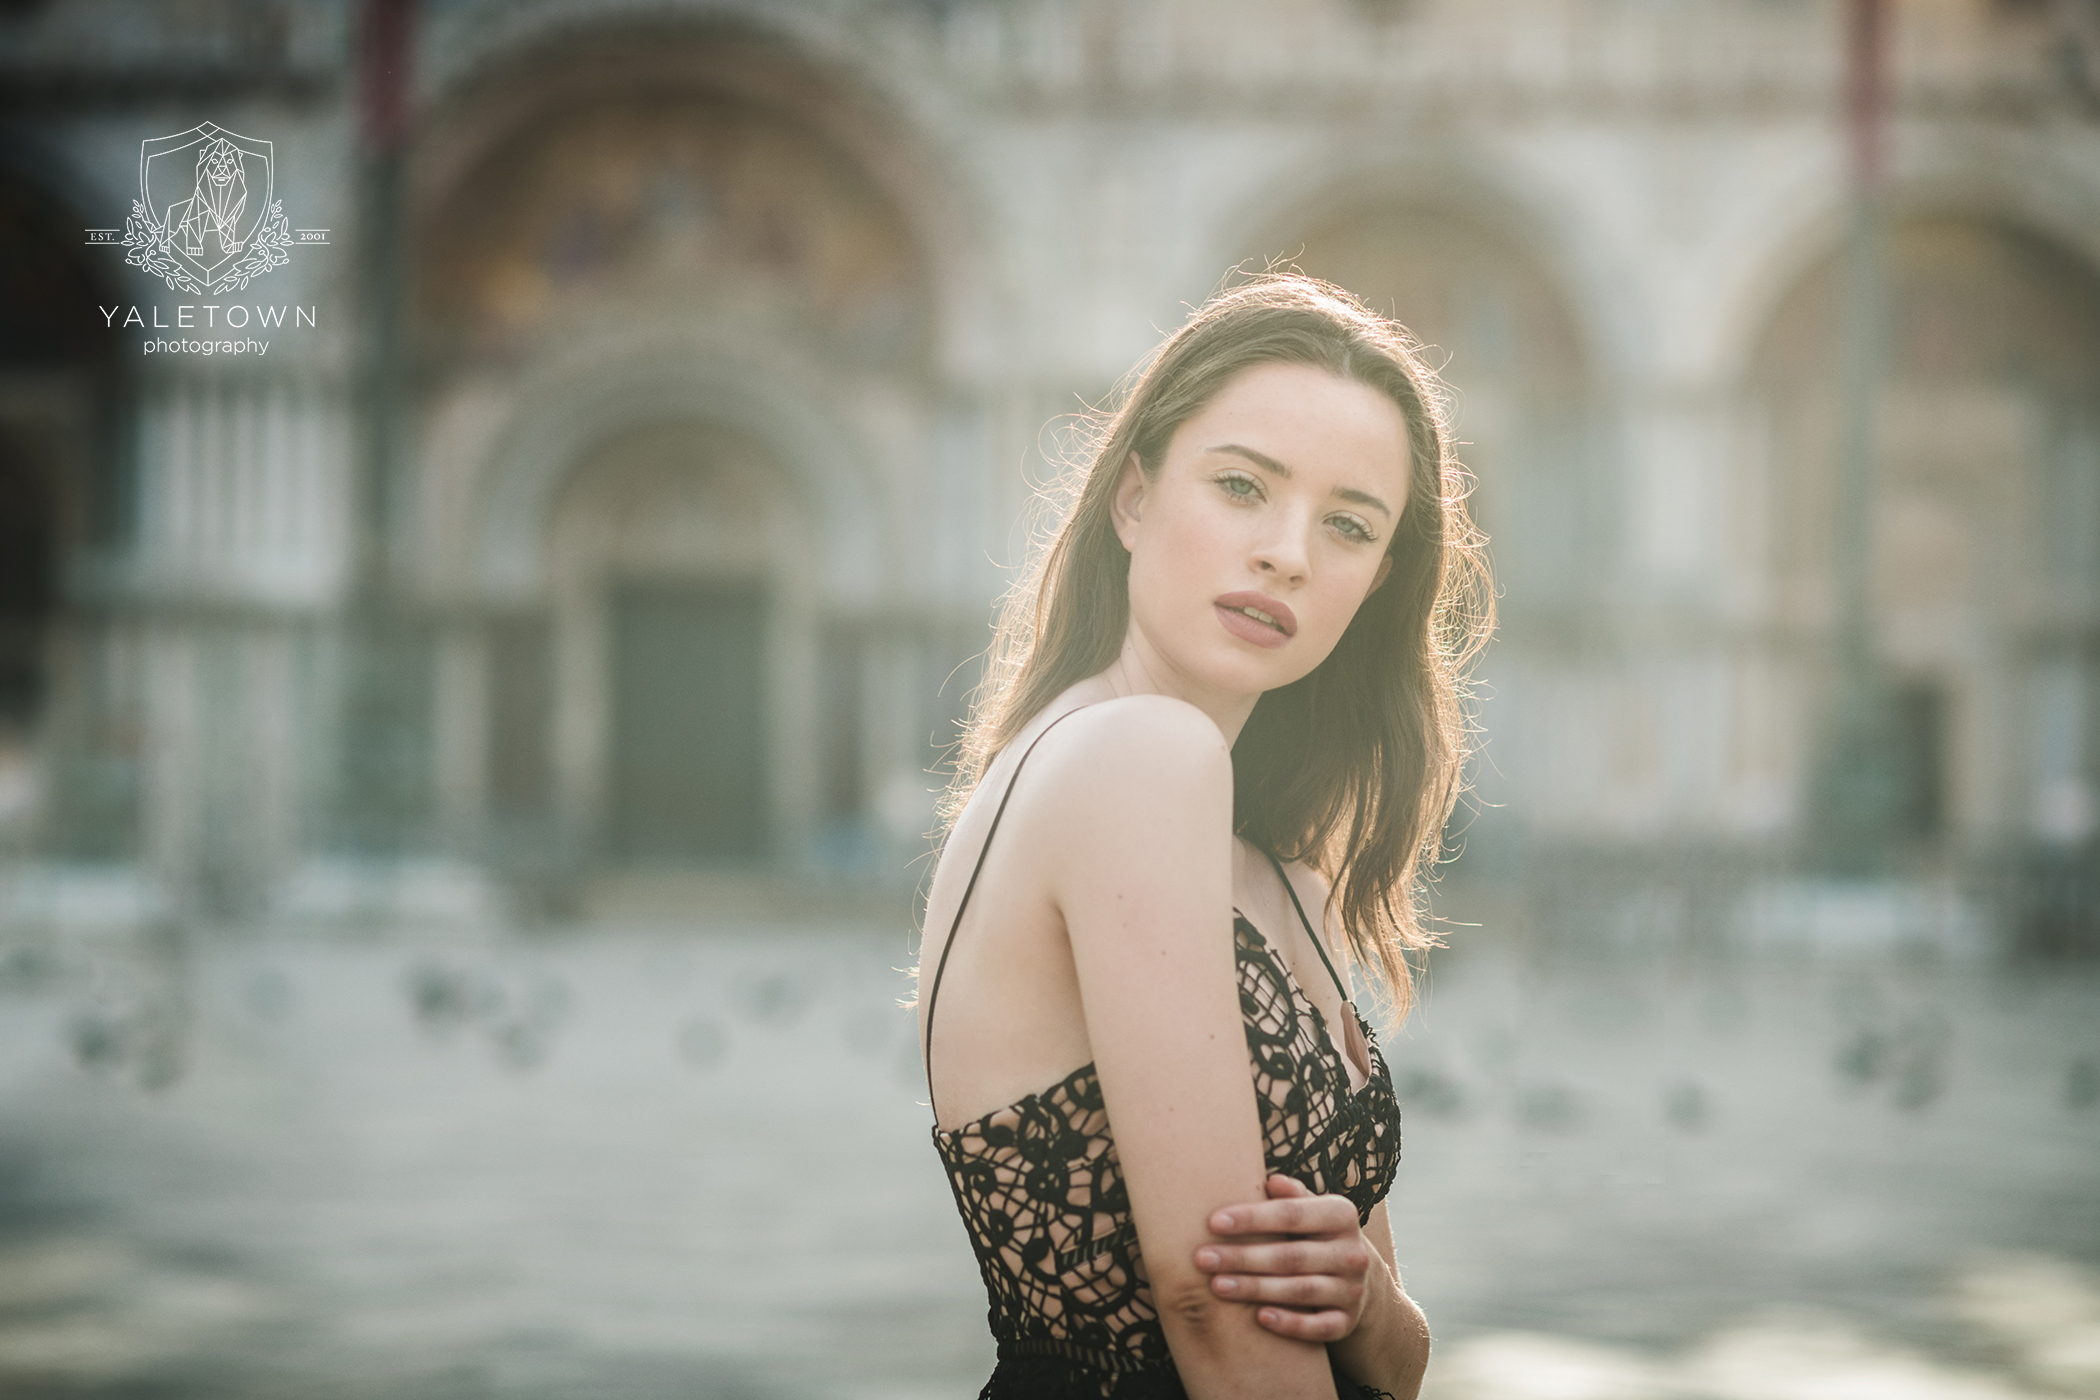 Venice-portrait-session-yaletown-photography-vacation-photographer-photo-004.jpg